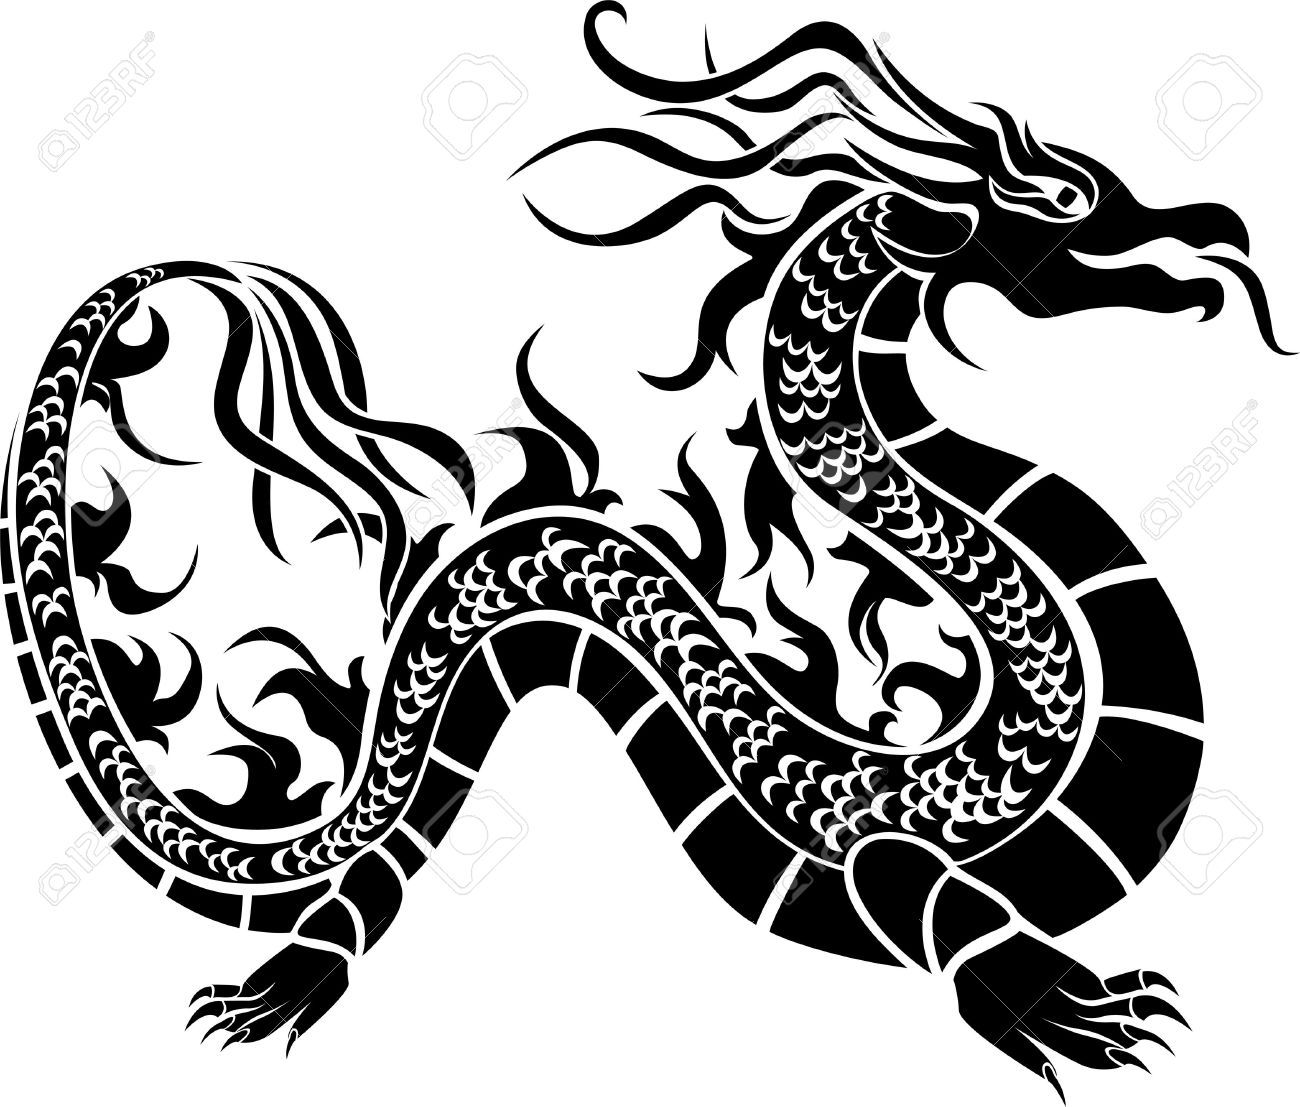 graphic about Dragon Stencil Printable identify dragon stencil printable - Google Glance Дракони Дракони